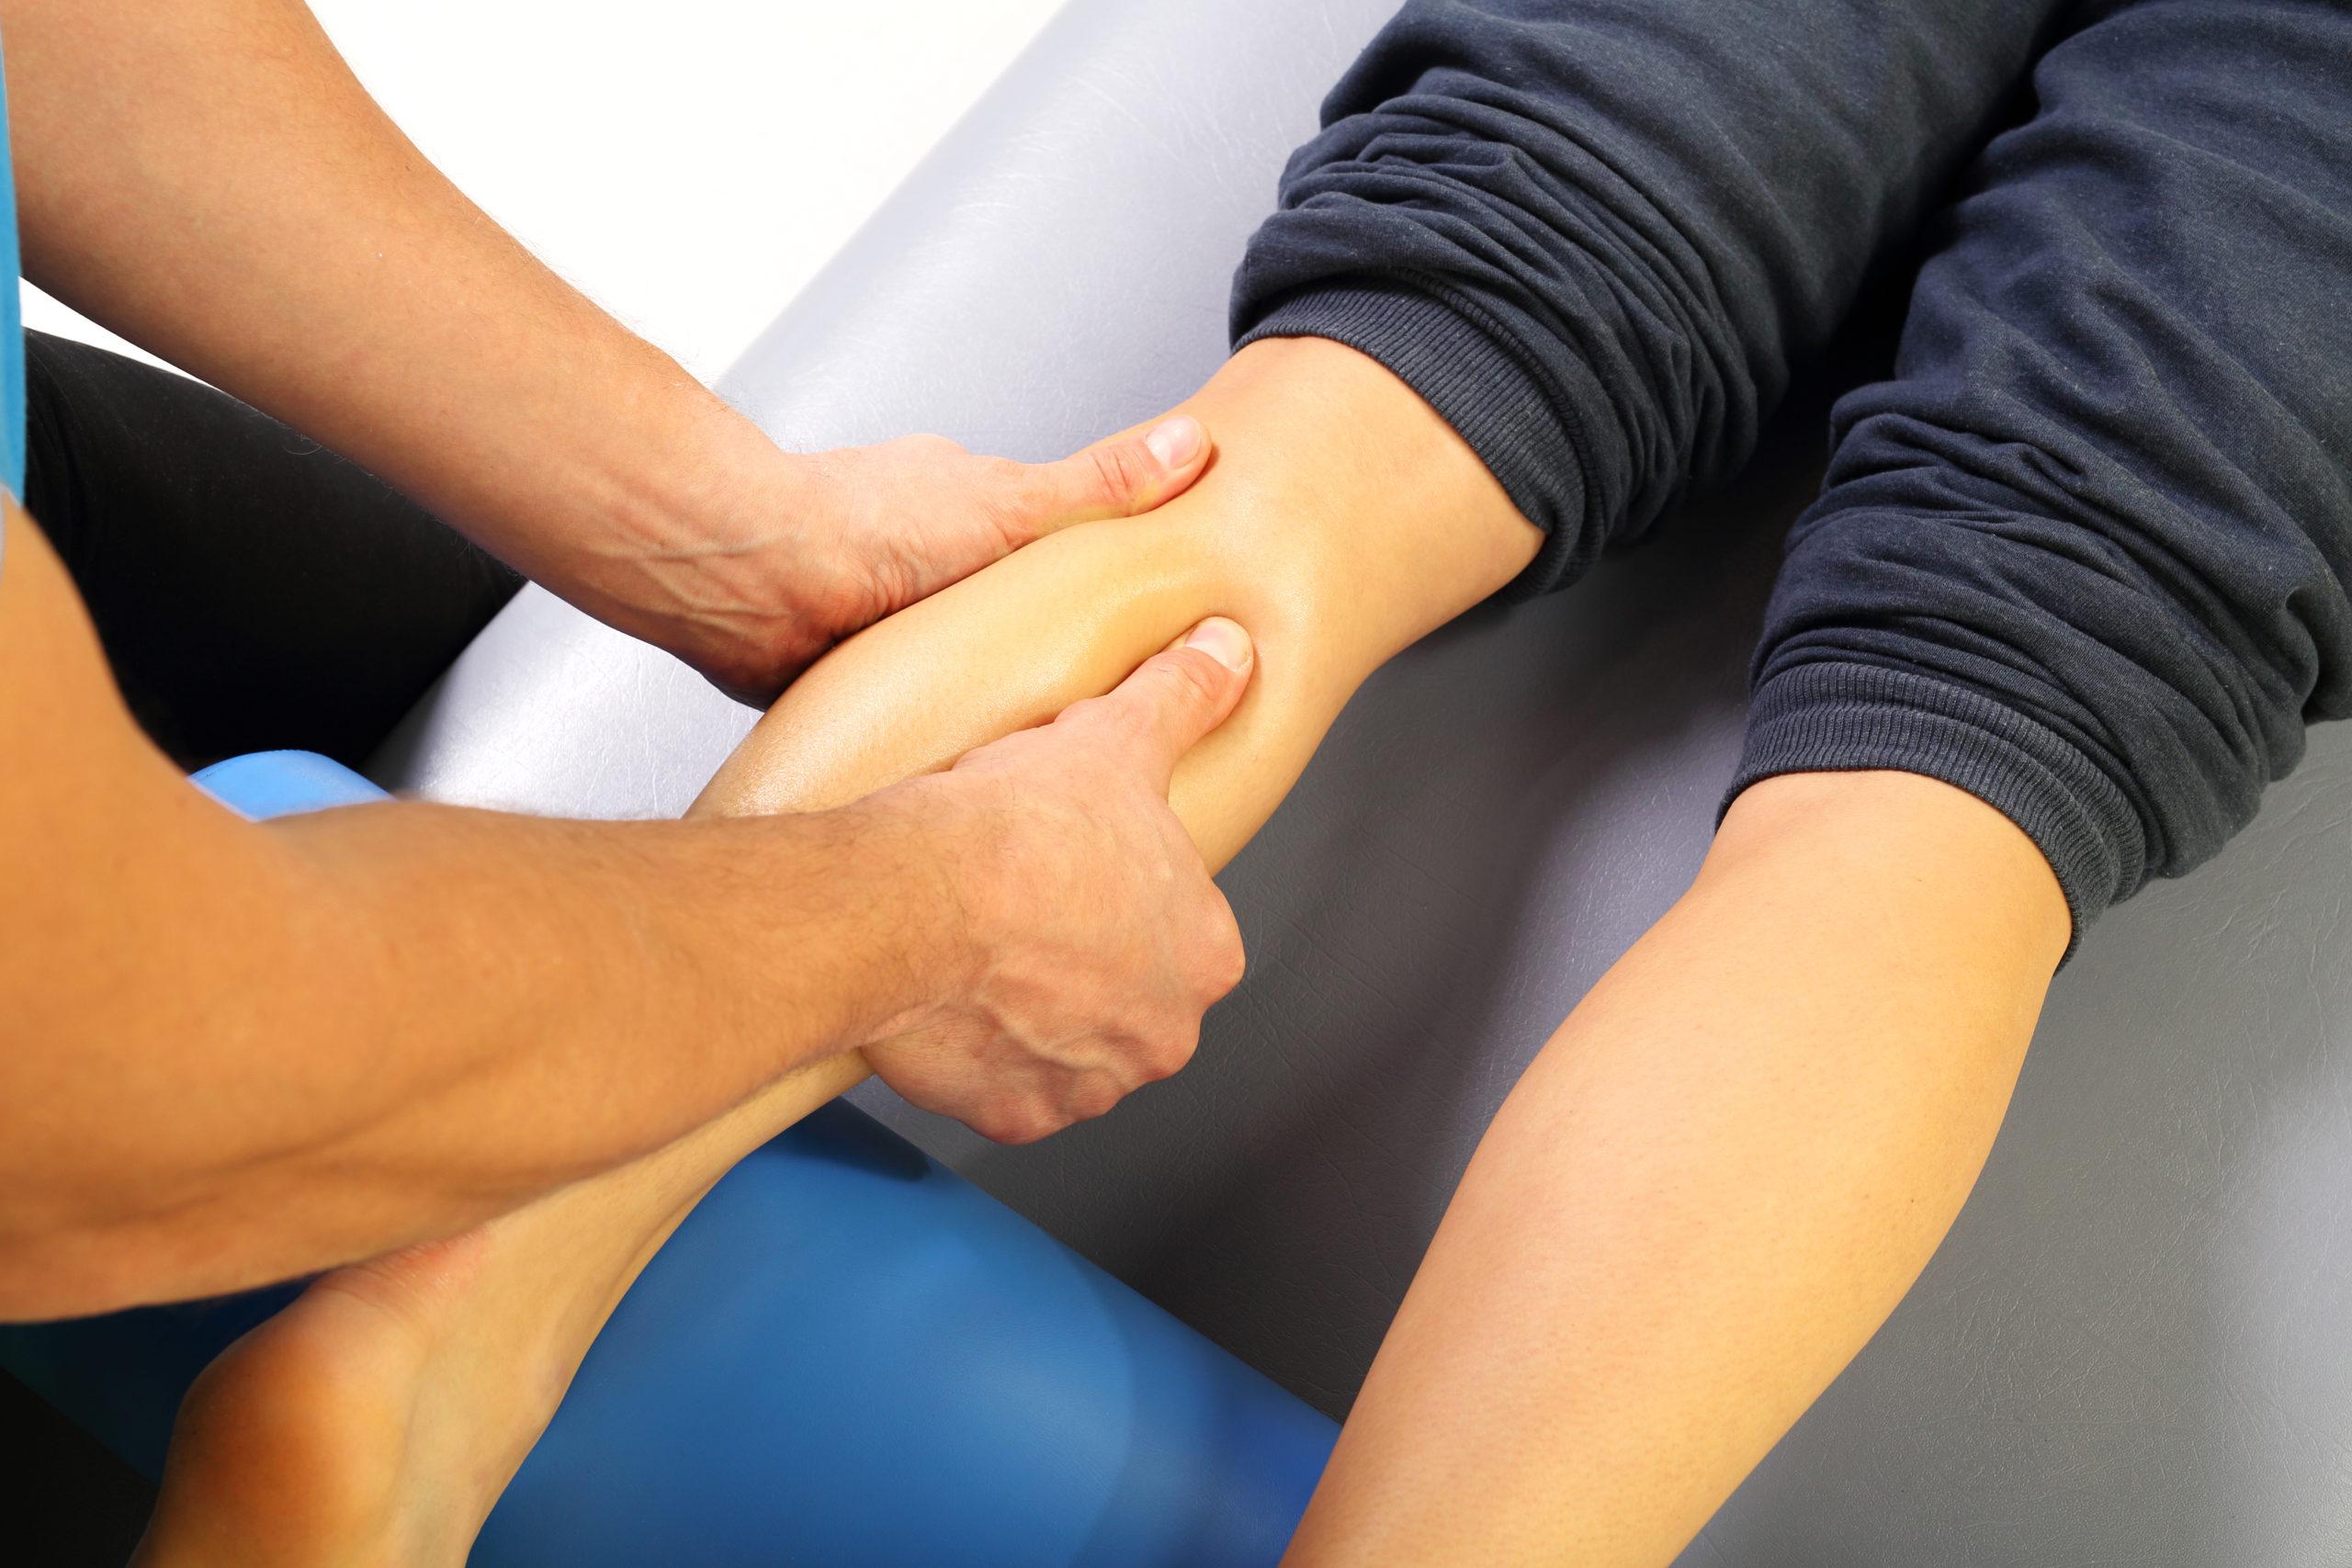 Physiotherapist using deep tissue massage to treat muscle soreness